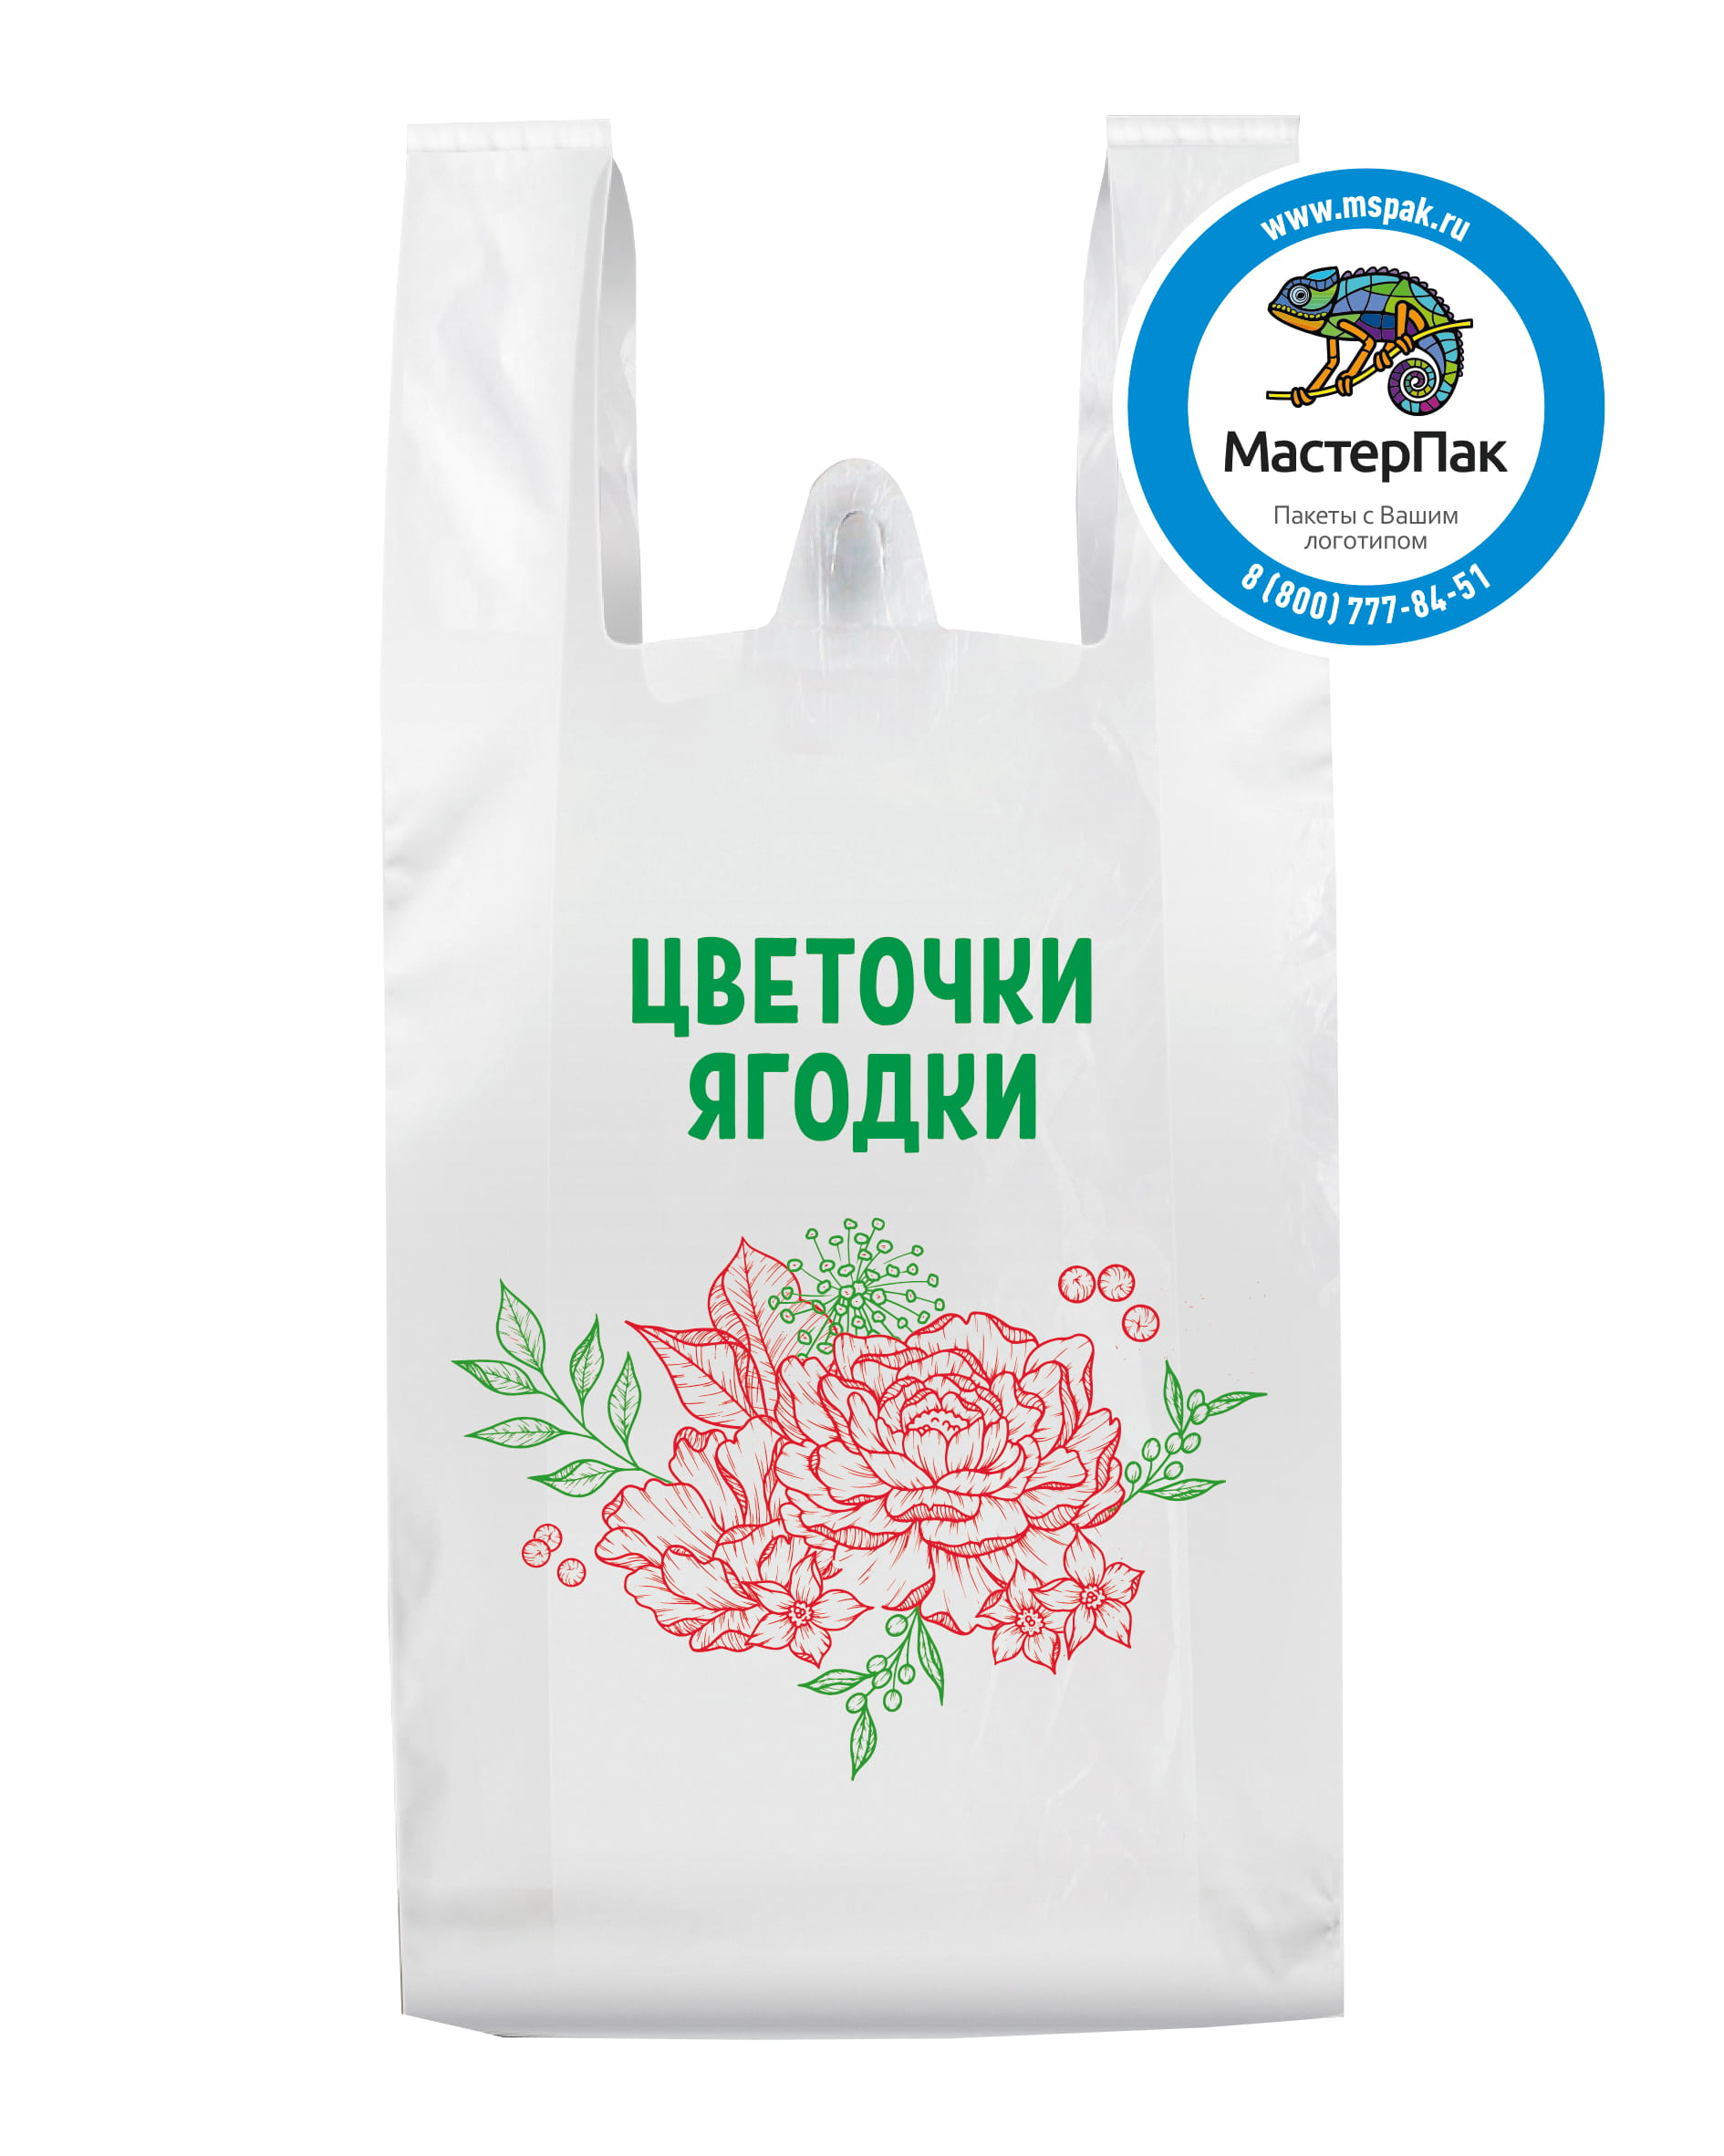 Пакет-майка ПНД, белый, с логотипом Цветочки ягодки, 23 мкм, 40*60